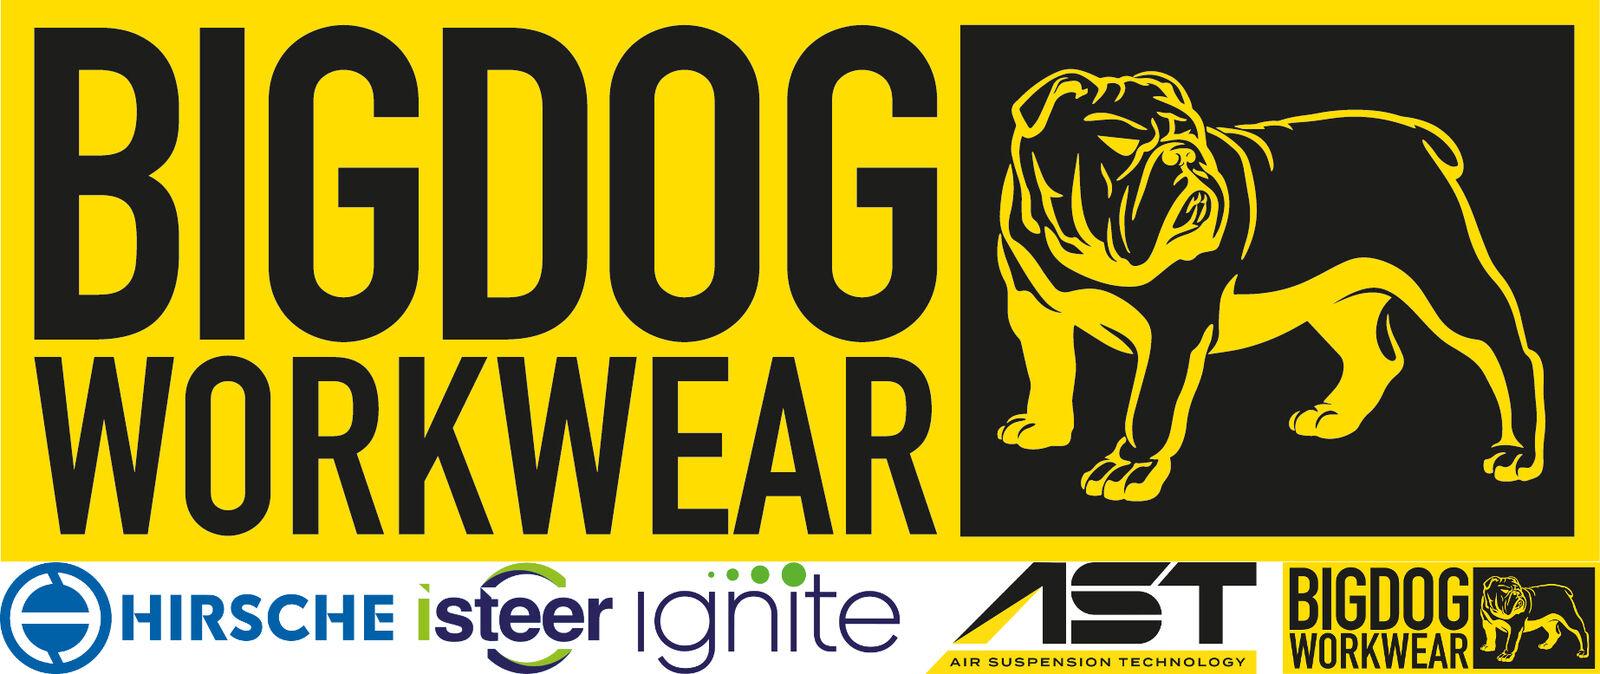 Bigdog Workwear